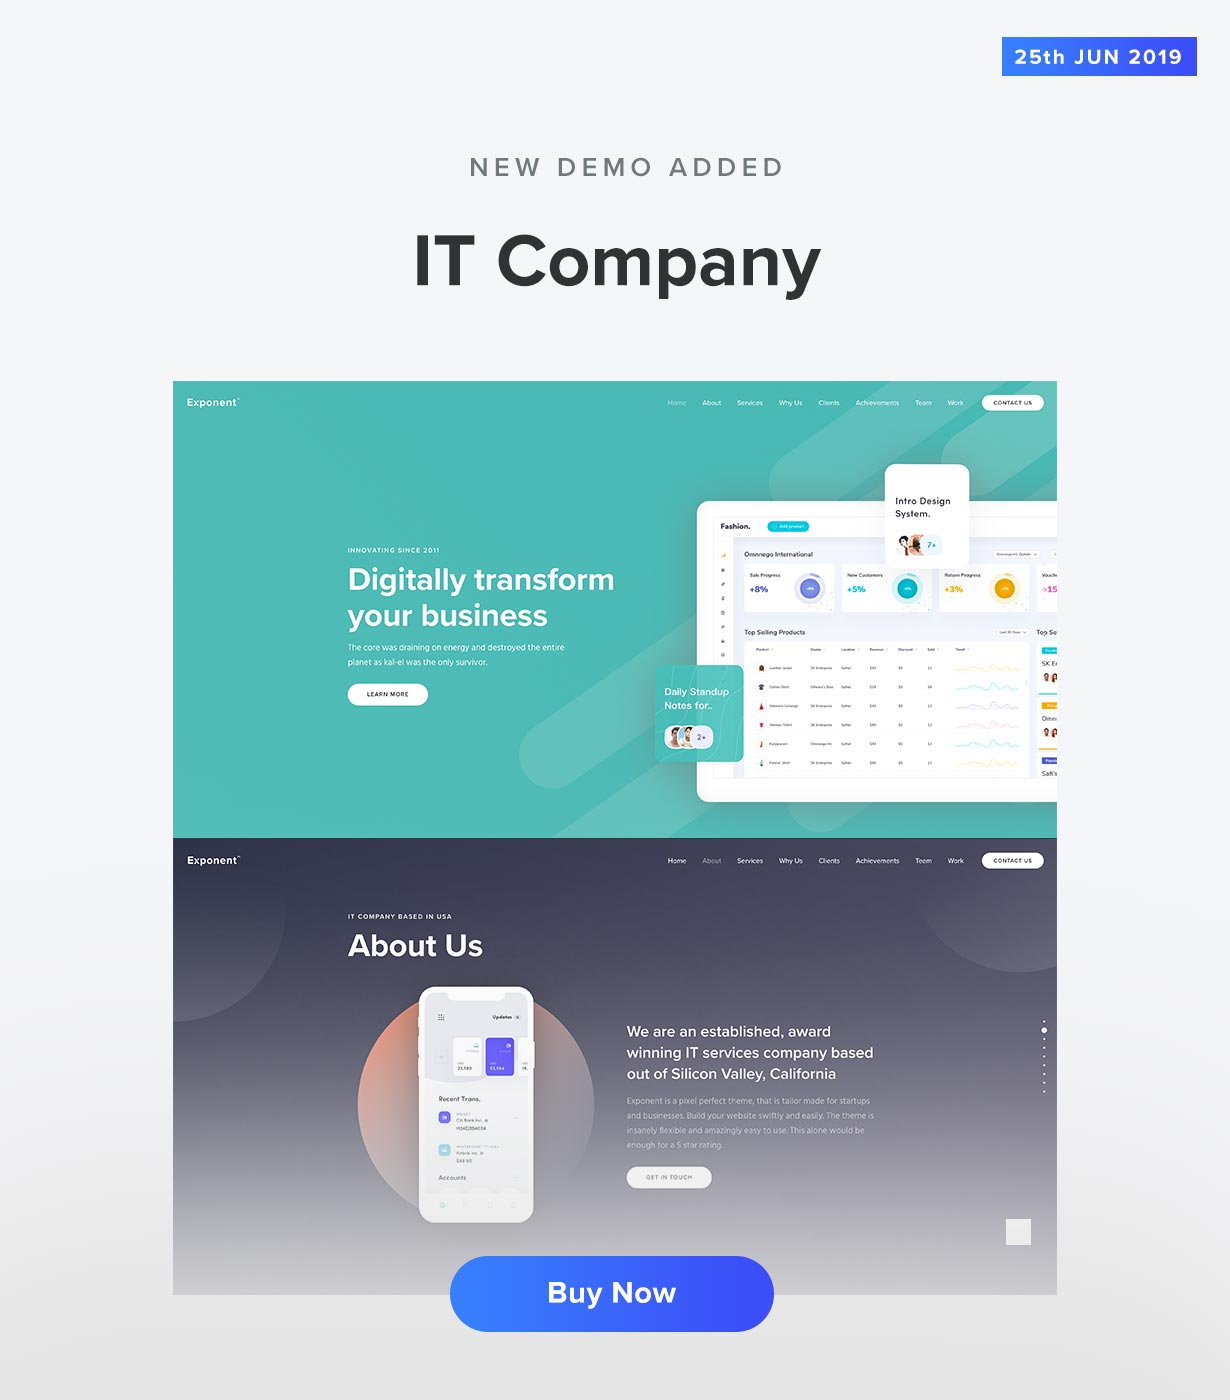 IT Company Demo